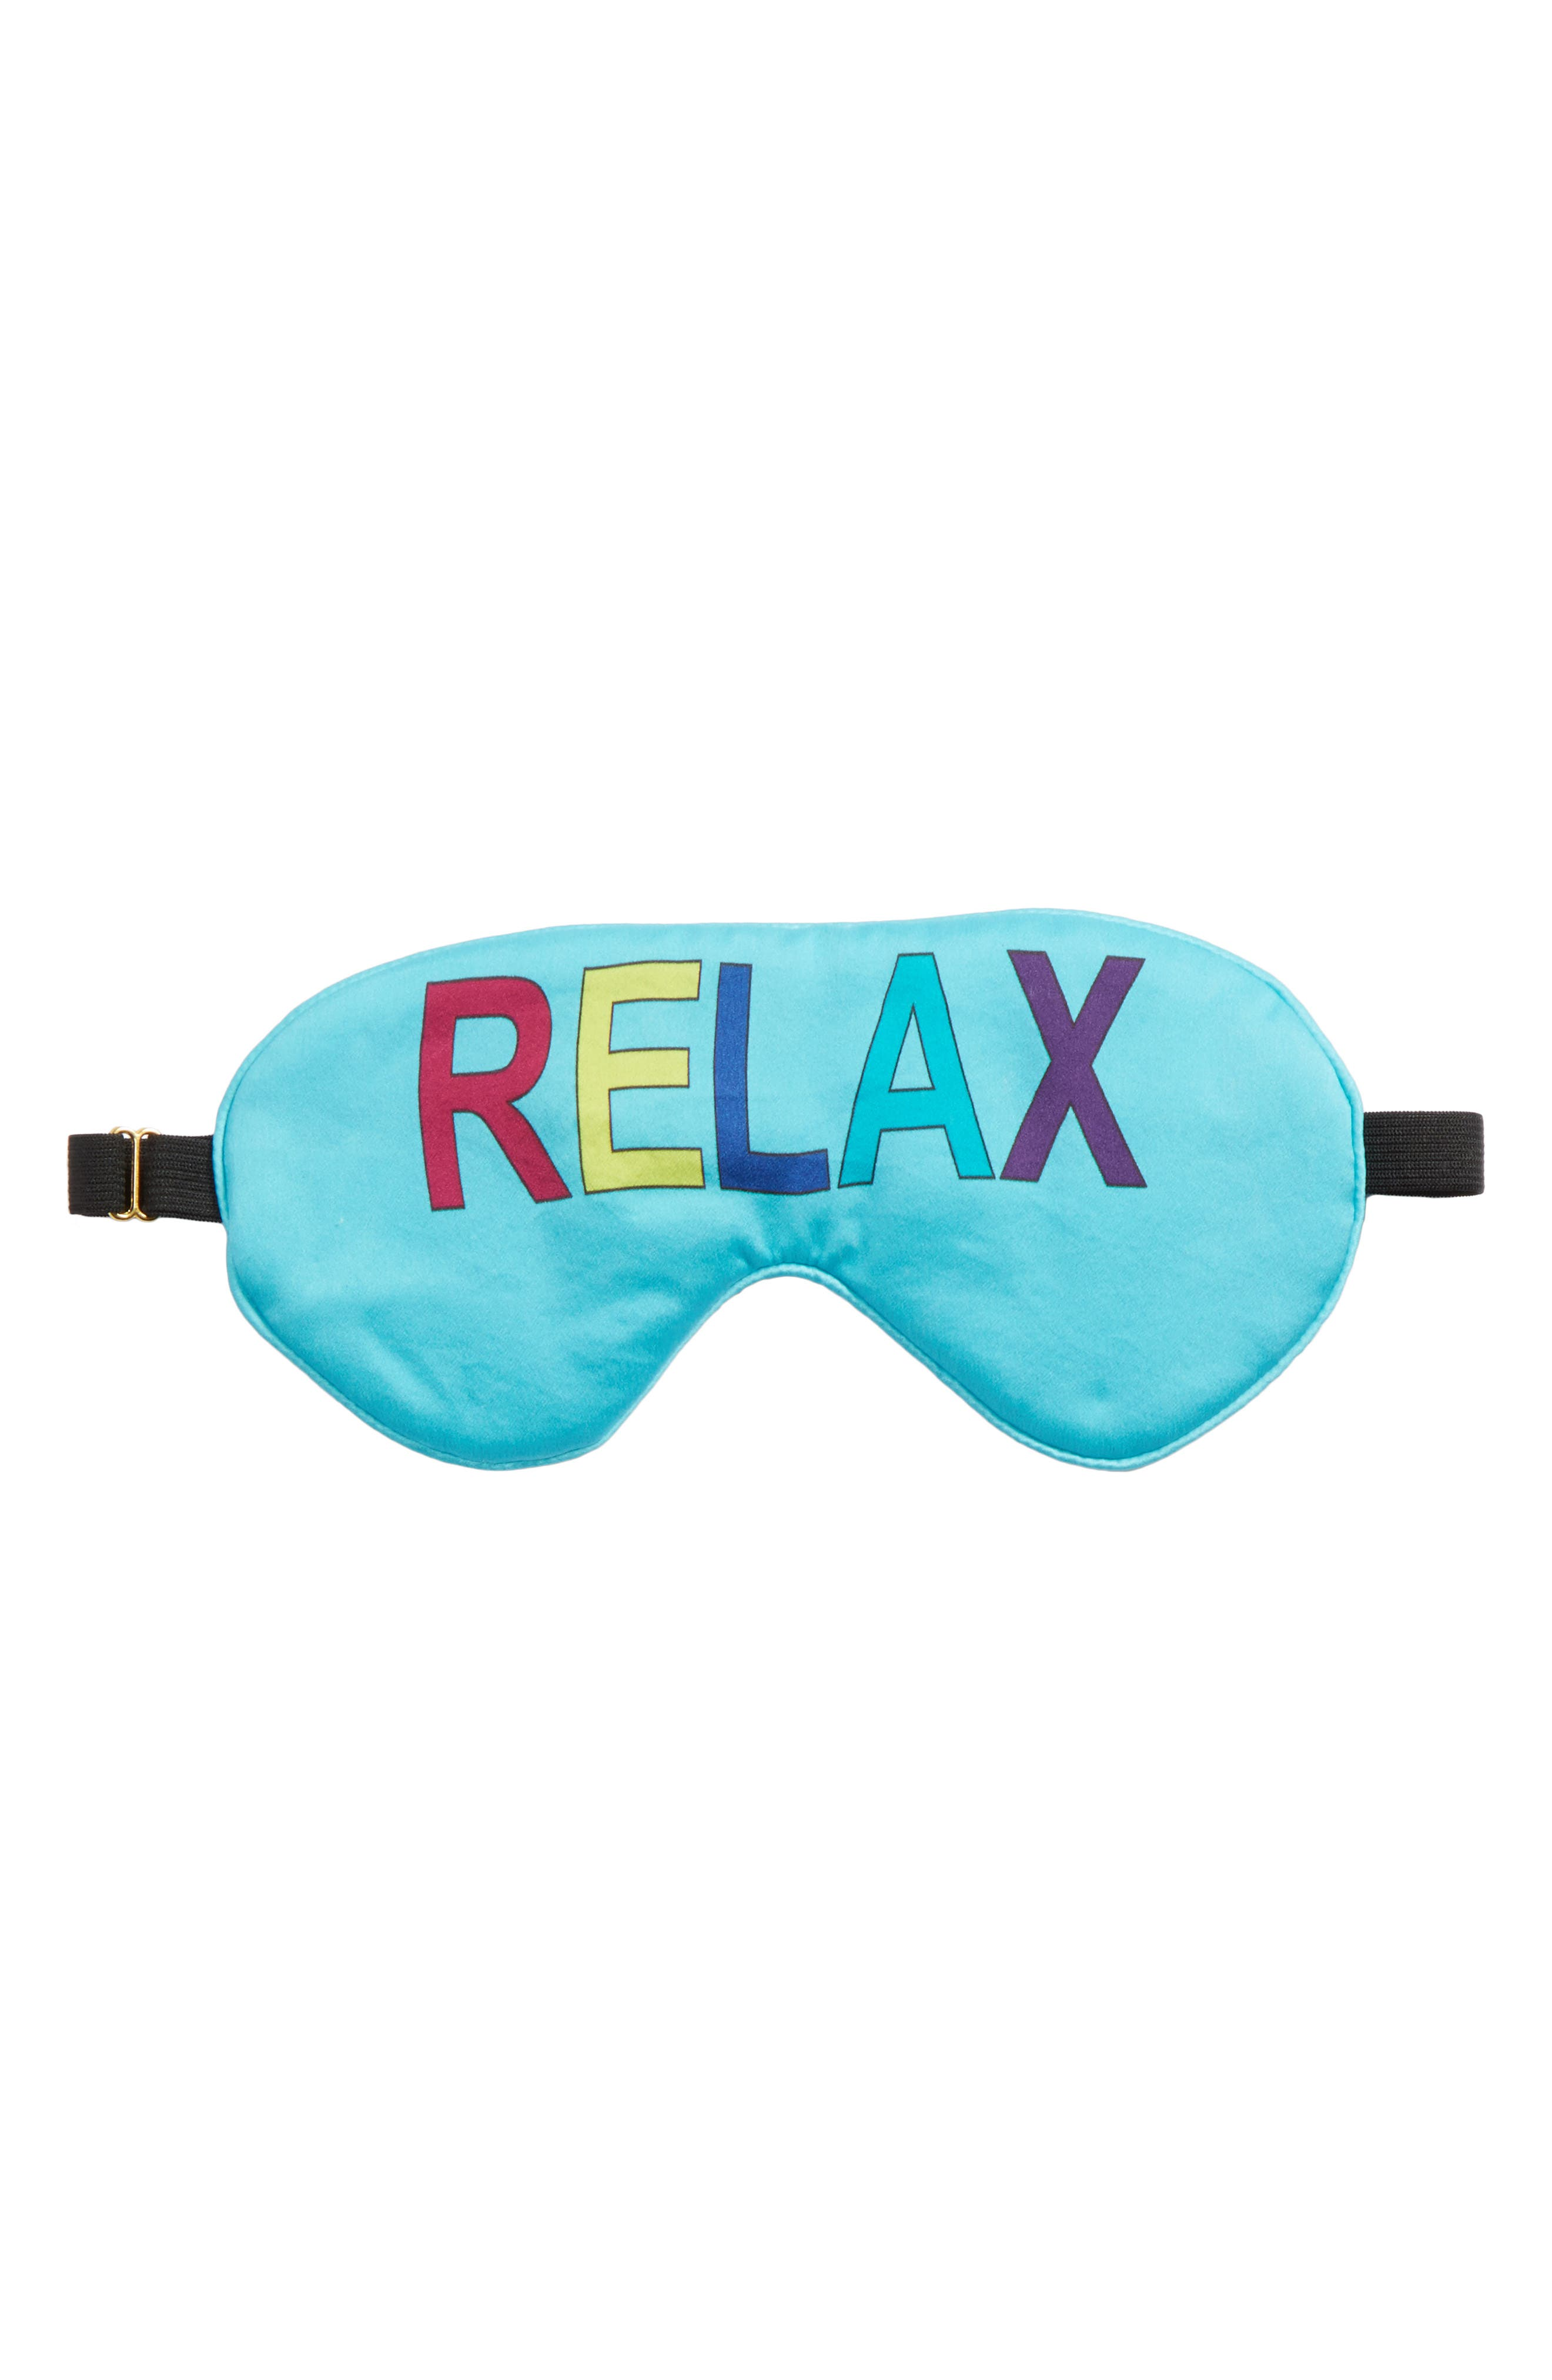 Relax Sleep Mask,                             Main thumbnail 1, color,                             400